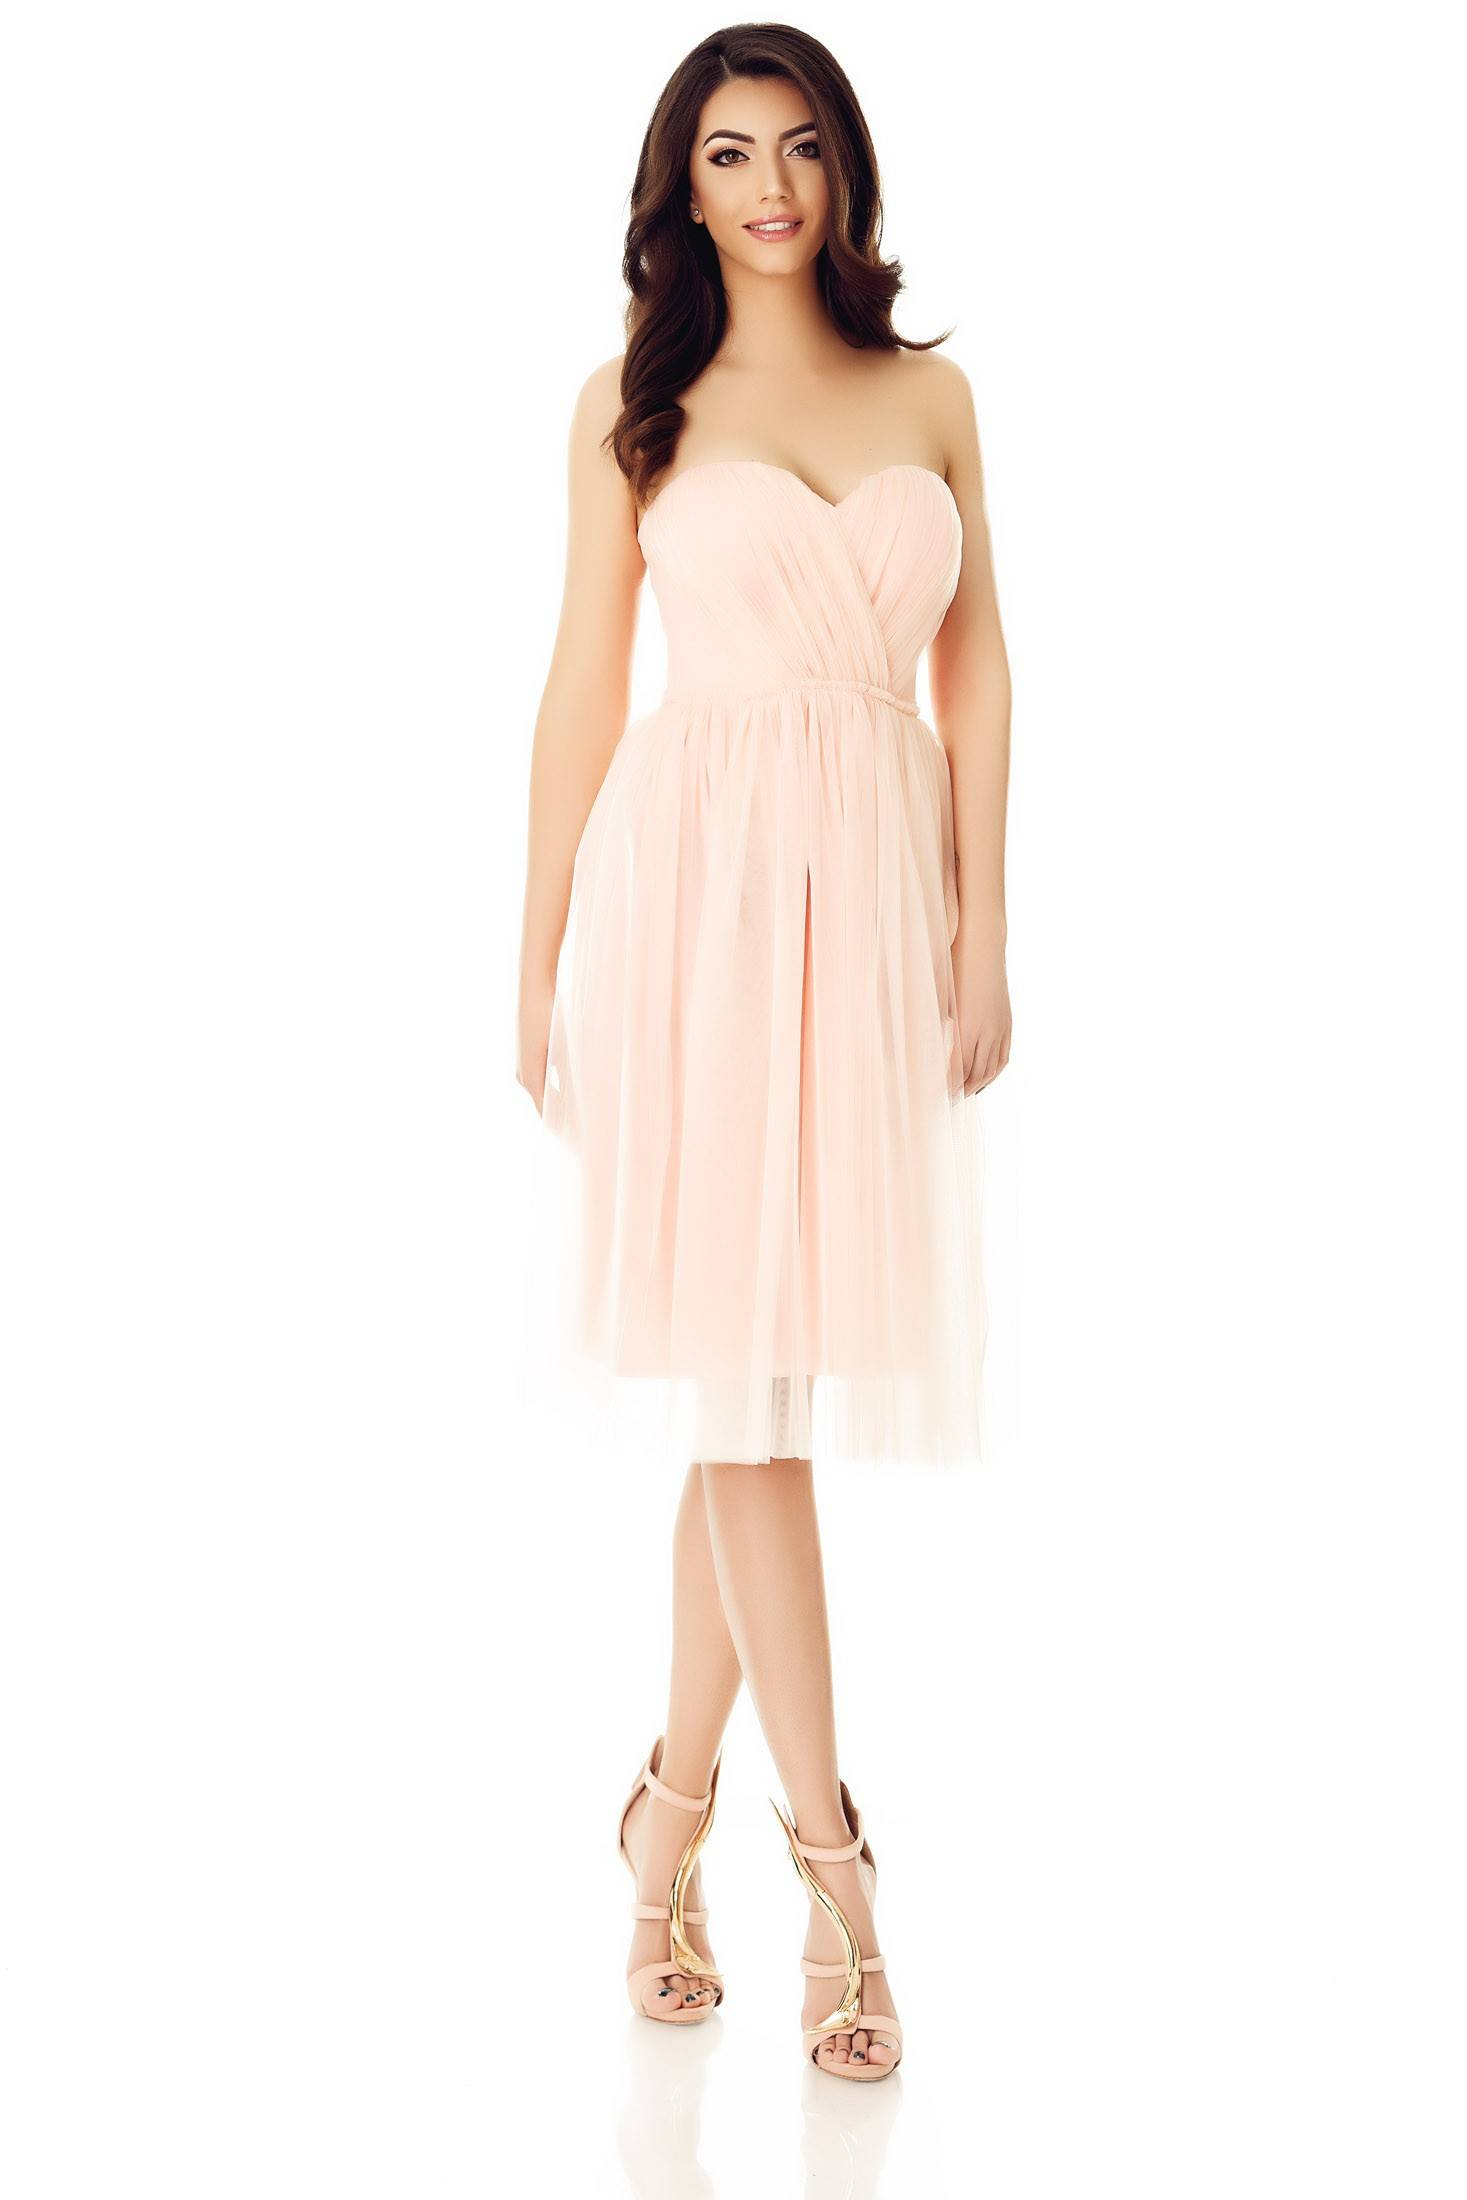 Rochii|rochii Baby Doll|rochii Cu Umerii Goi|rochii De Banchet|rochii De Botez|rochii De Cocktail|rochii De Cununie/rochii De Cununie Civila|rochii De Domnisoara De Onoare|rochii De Gala|rochii De Nunta|rochii De Ocazie|rochii De Primavara|rochii De Revel